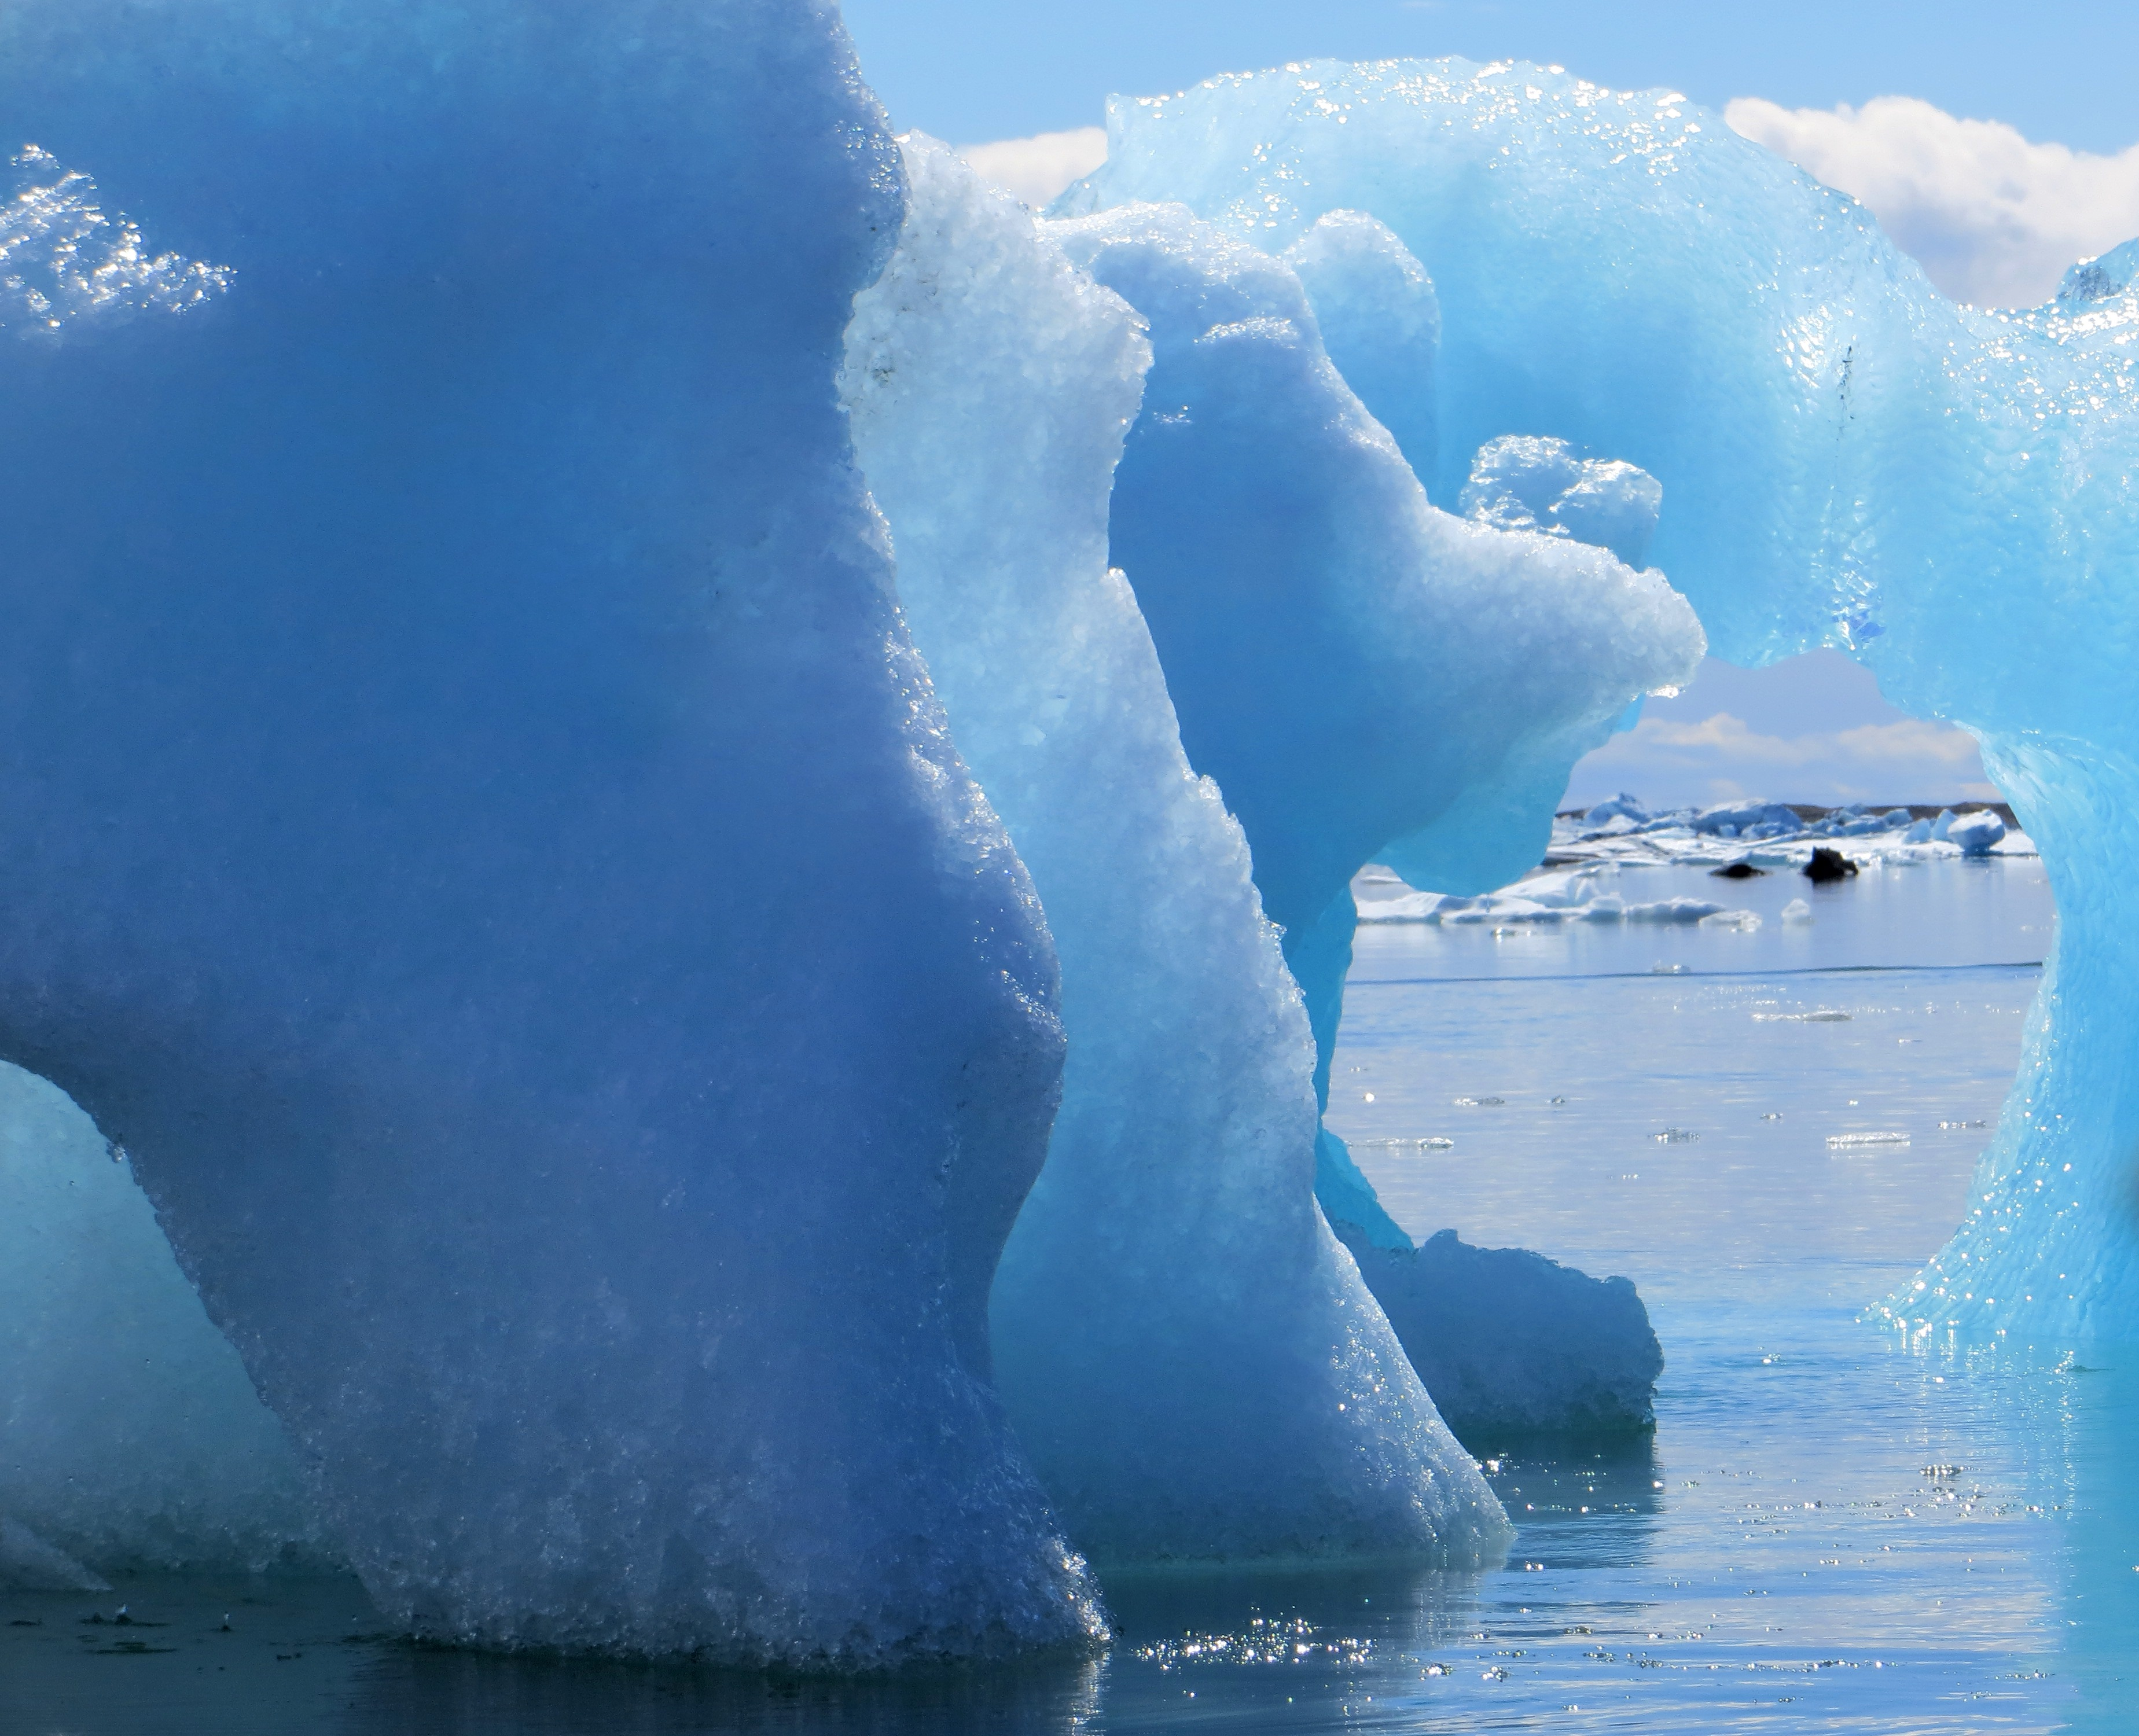 Iceland 6 by LeikyaStock